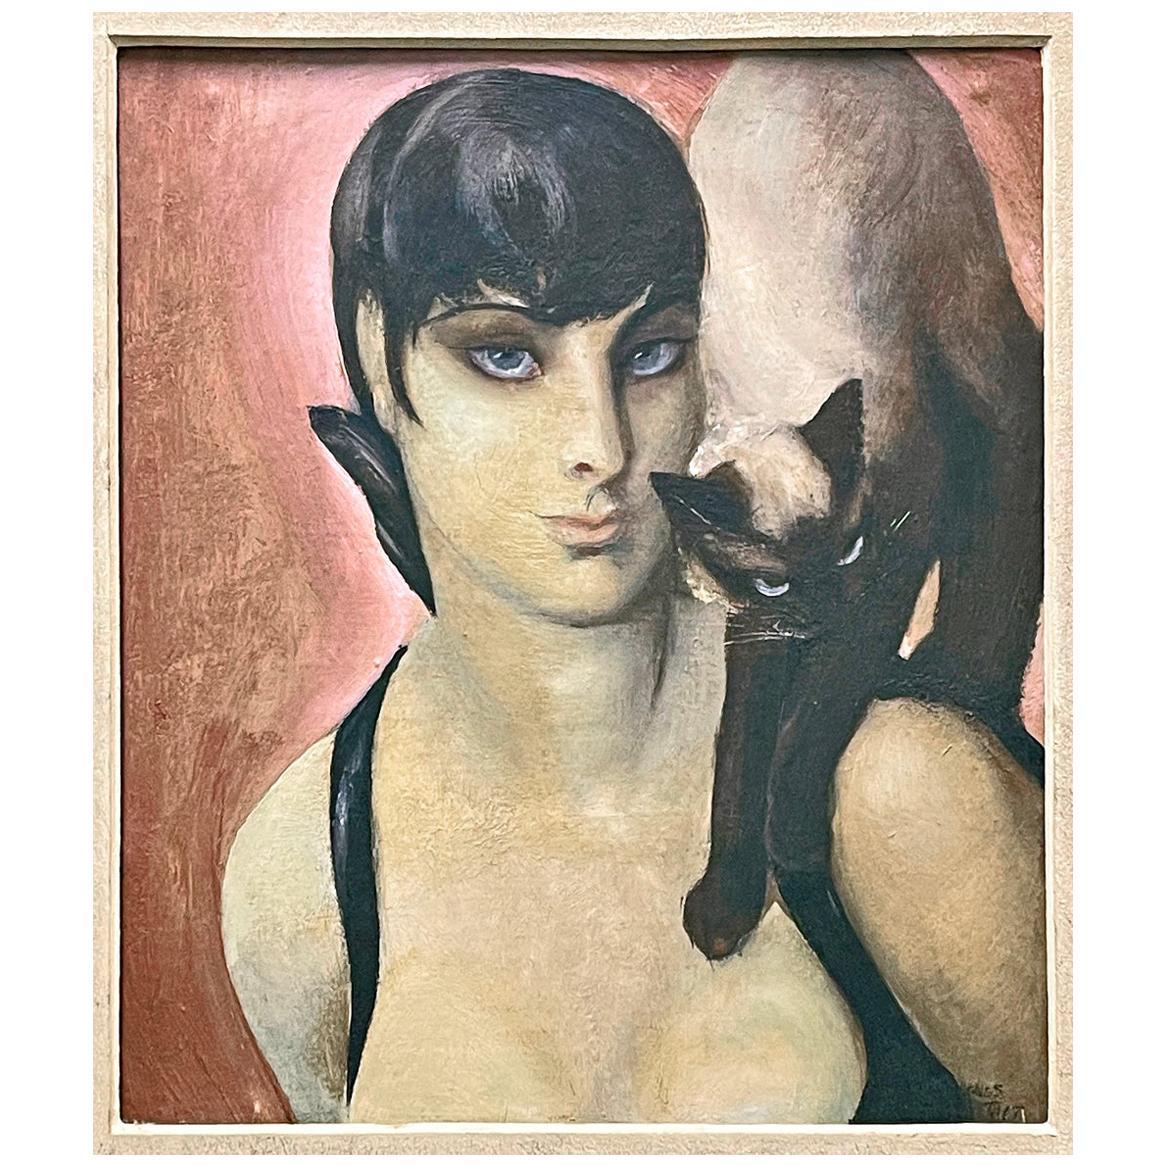 """Siamese Twins,"" Fabulous Art Deco Portrait with Siamese Cat and Female Figure"